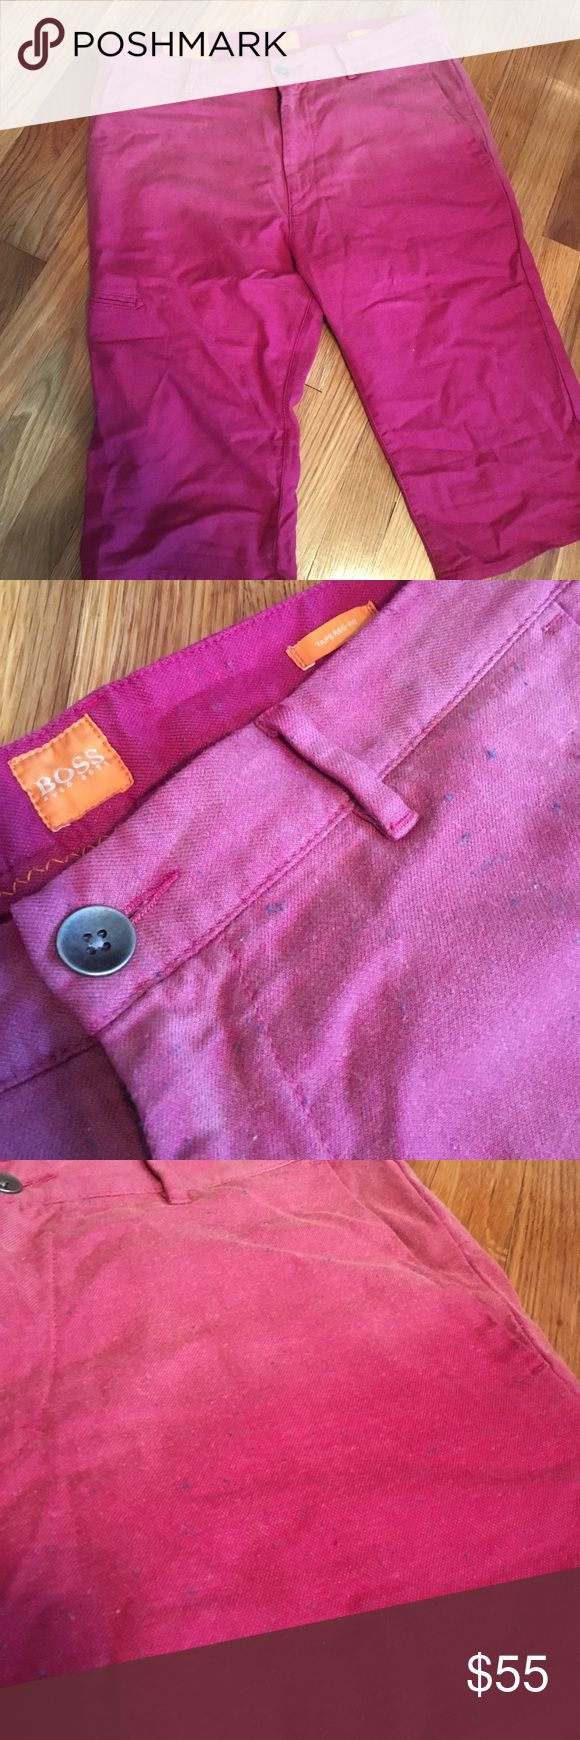 Nwt. Hugo Boss orange shorts Nwt. Hugo Boss orange shorts BOSS ORANGE Shorts